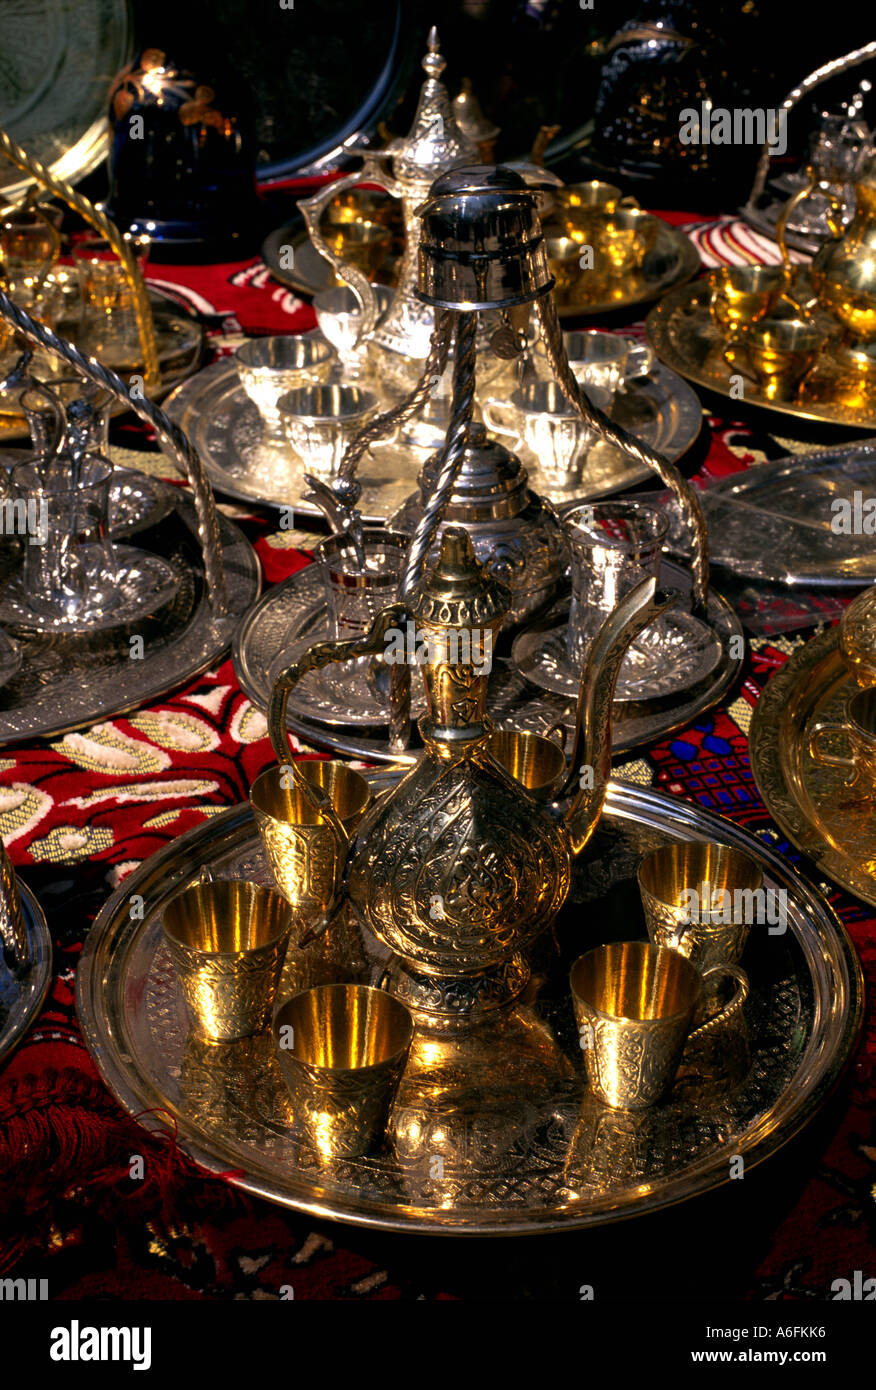 Turkey Istanbul Craft Industry Brass Stock Photo 6607221 Alamy